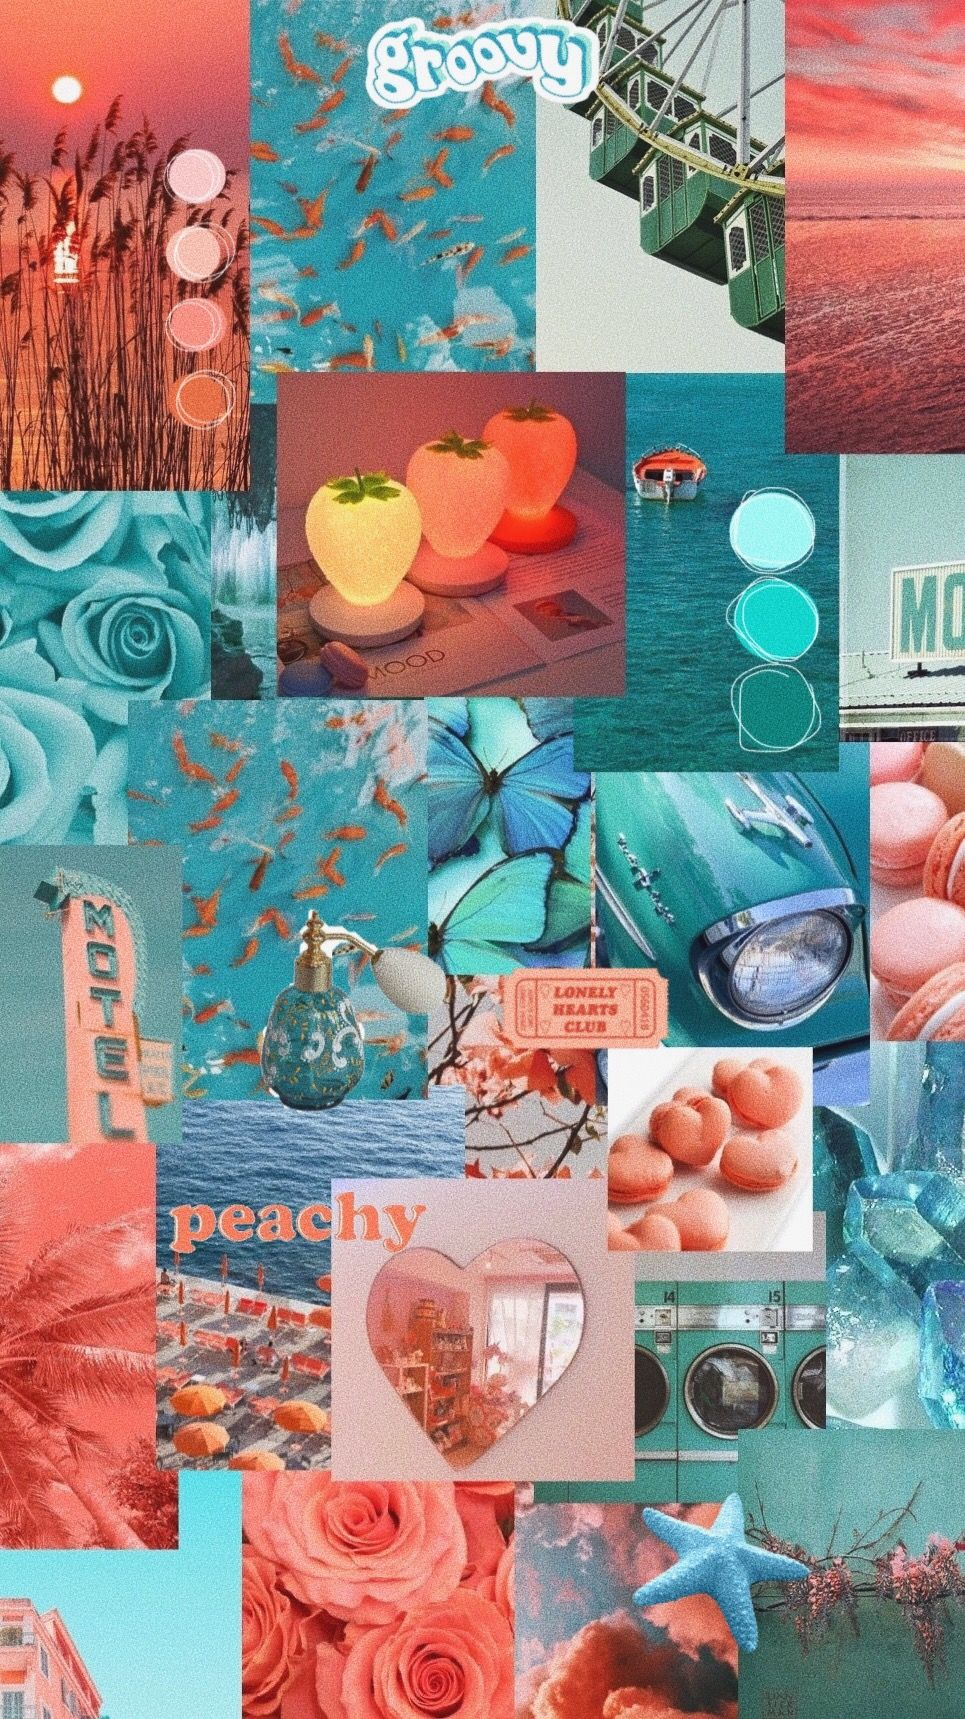 turquoise coral pink blue teal cyan aqua peach